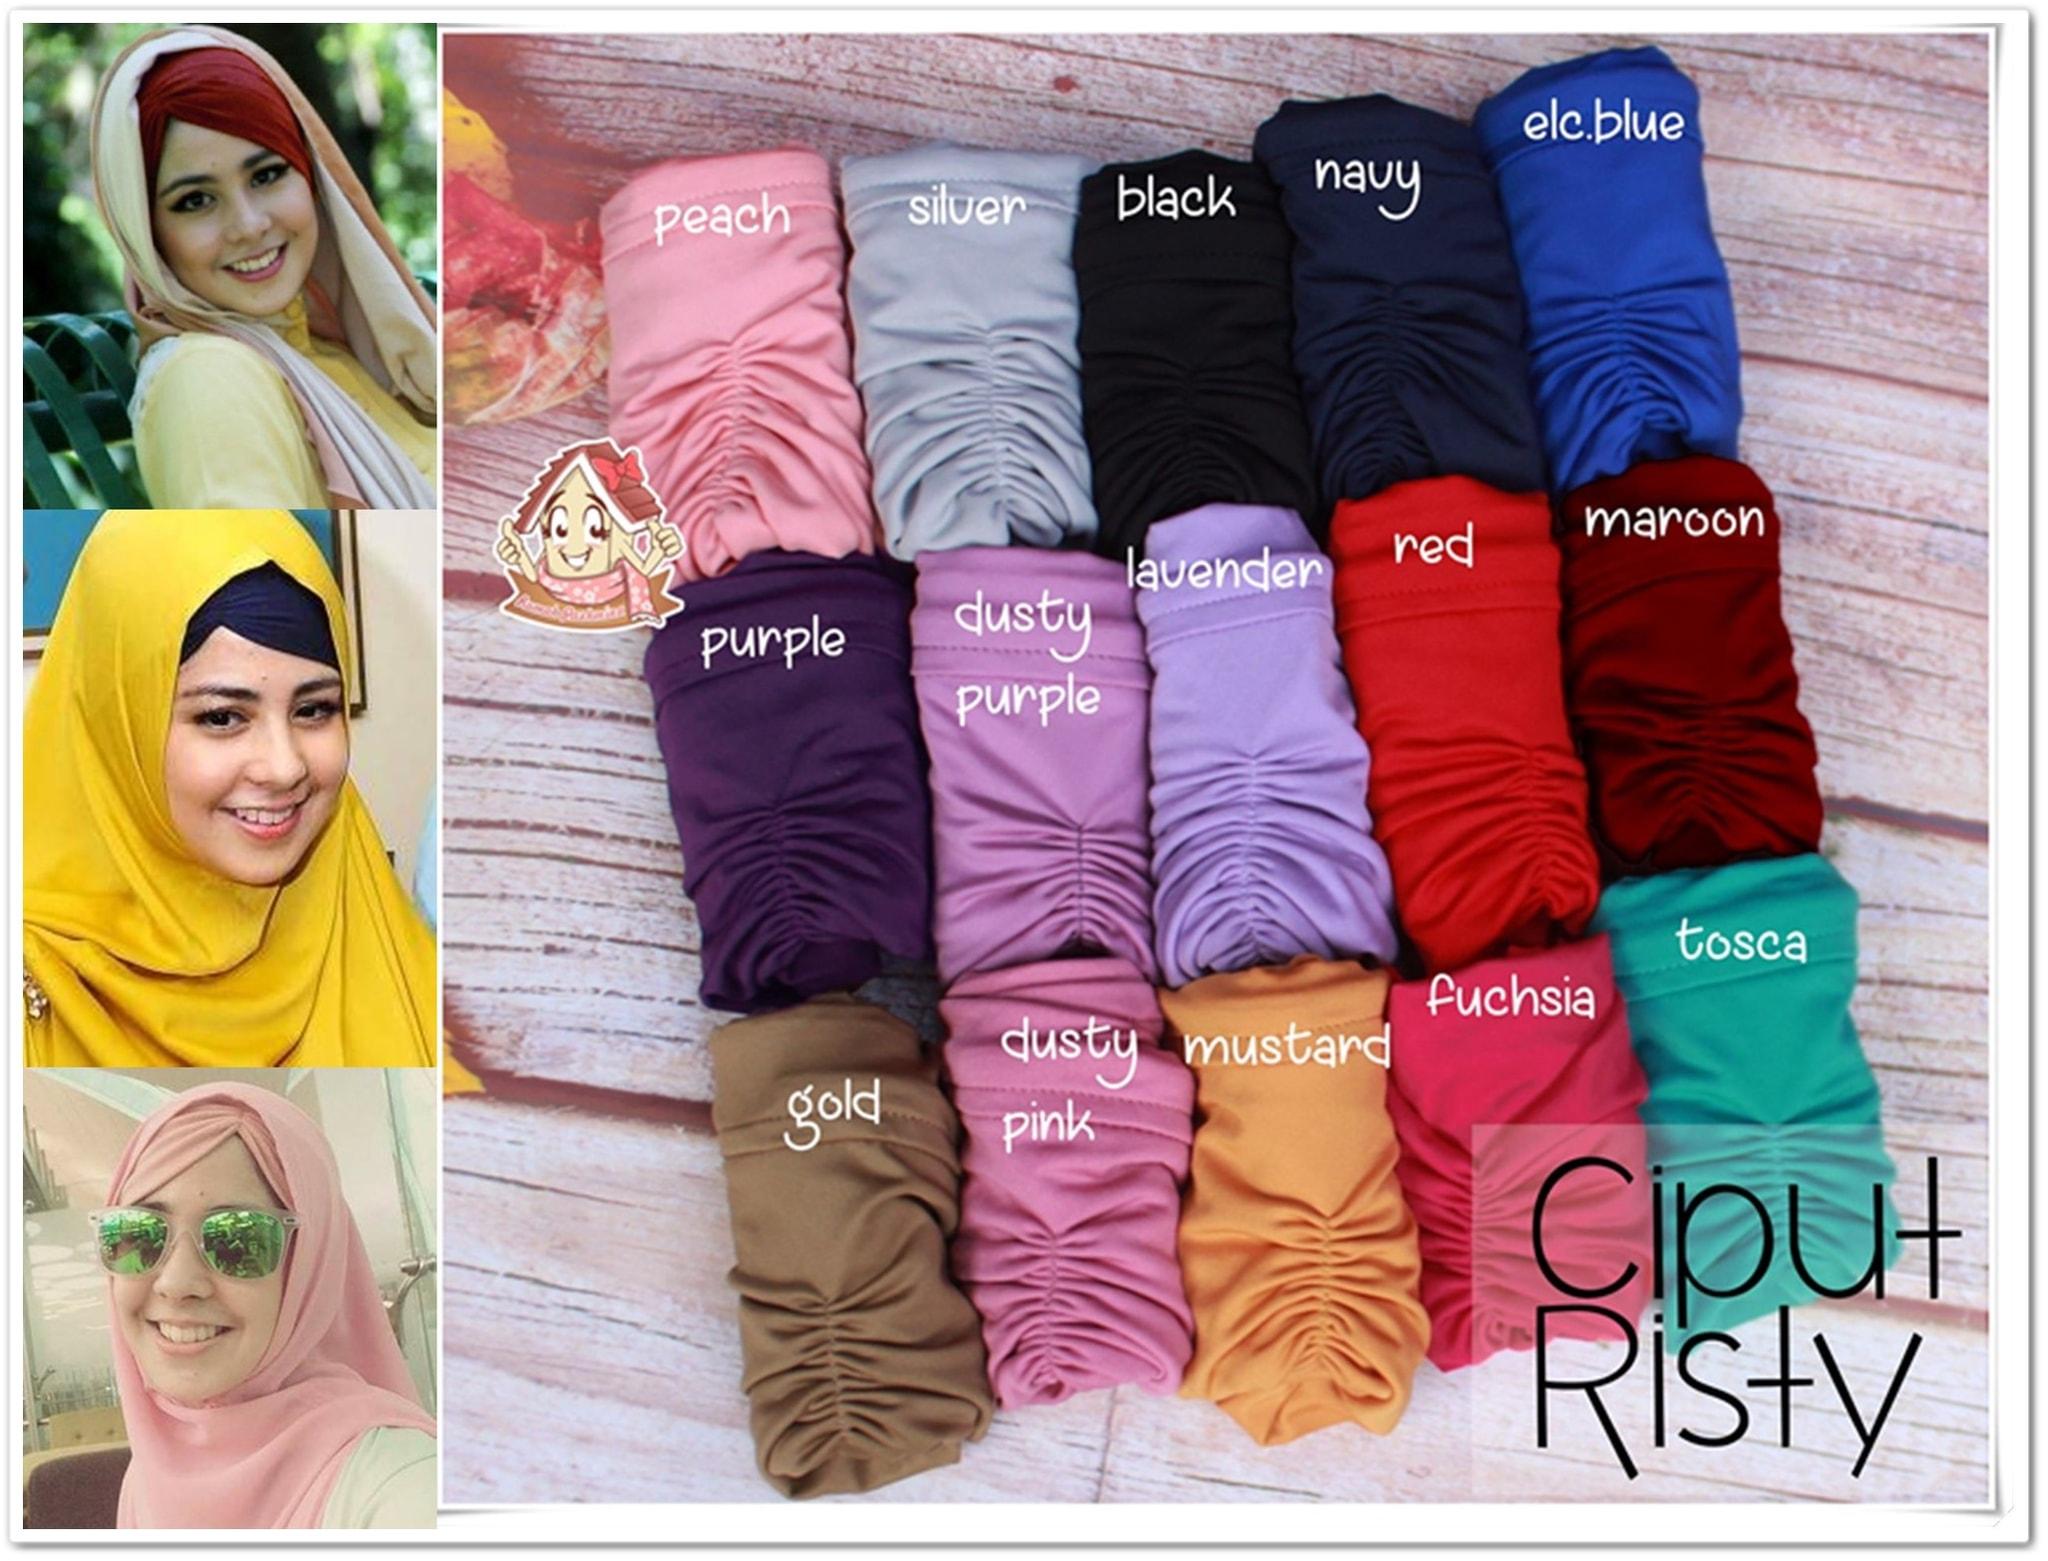 ciput - inner arab - bandana hijab - CIPUT ARAB RISTY - kerut - poni